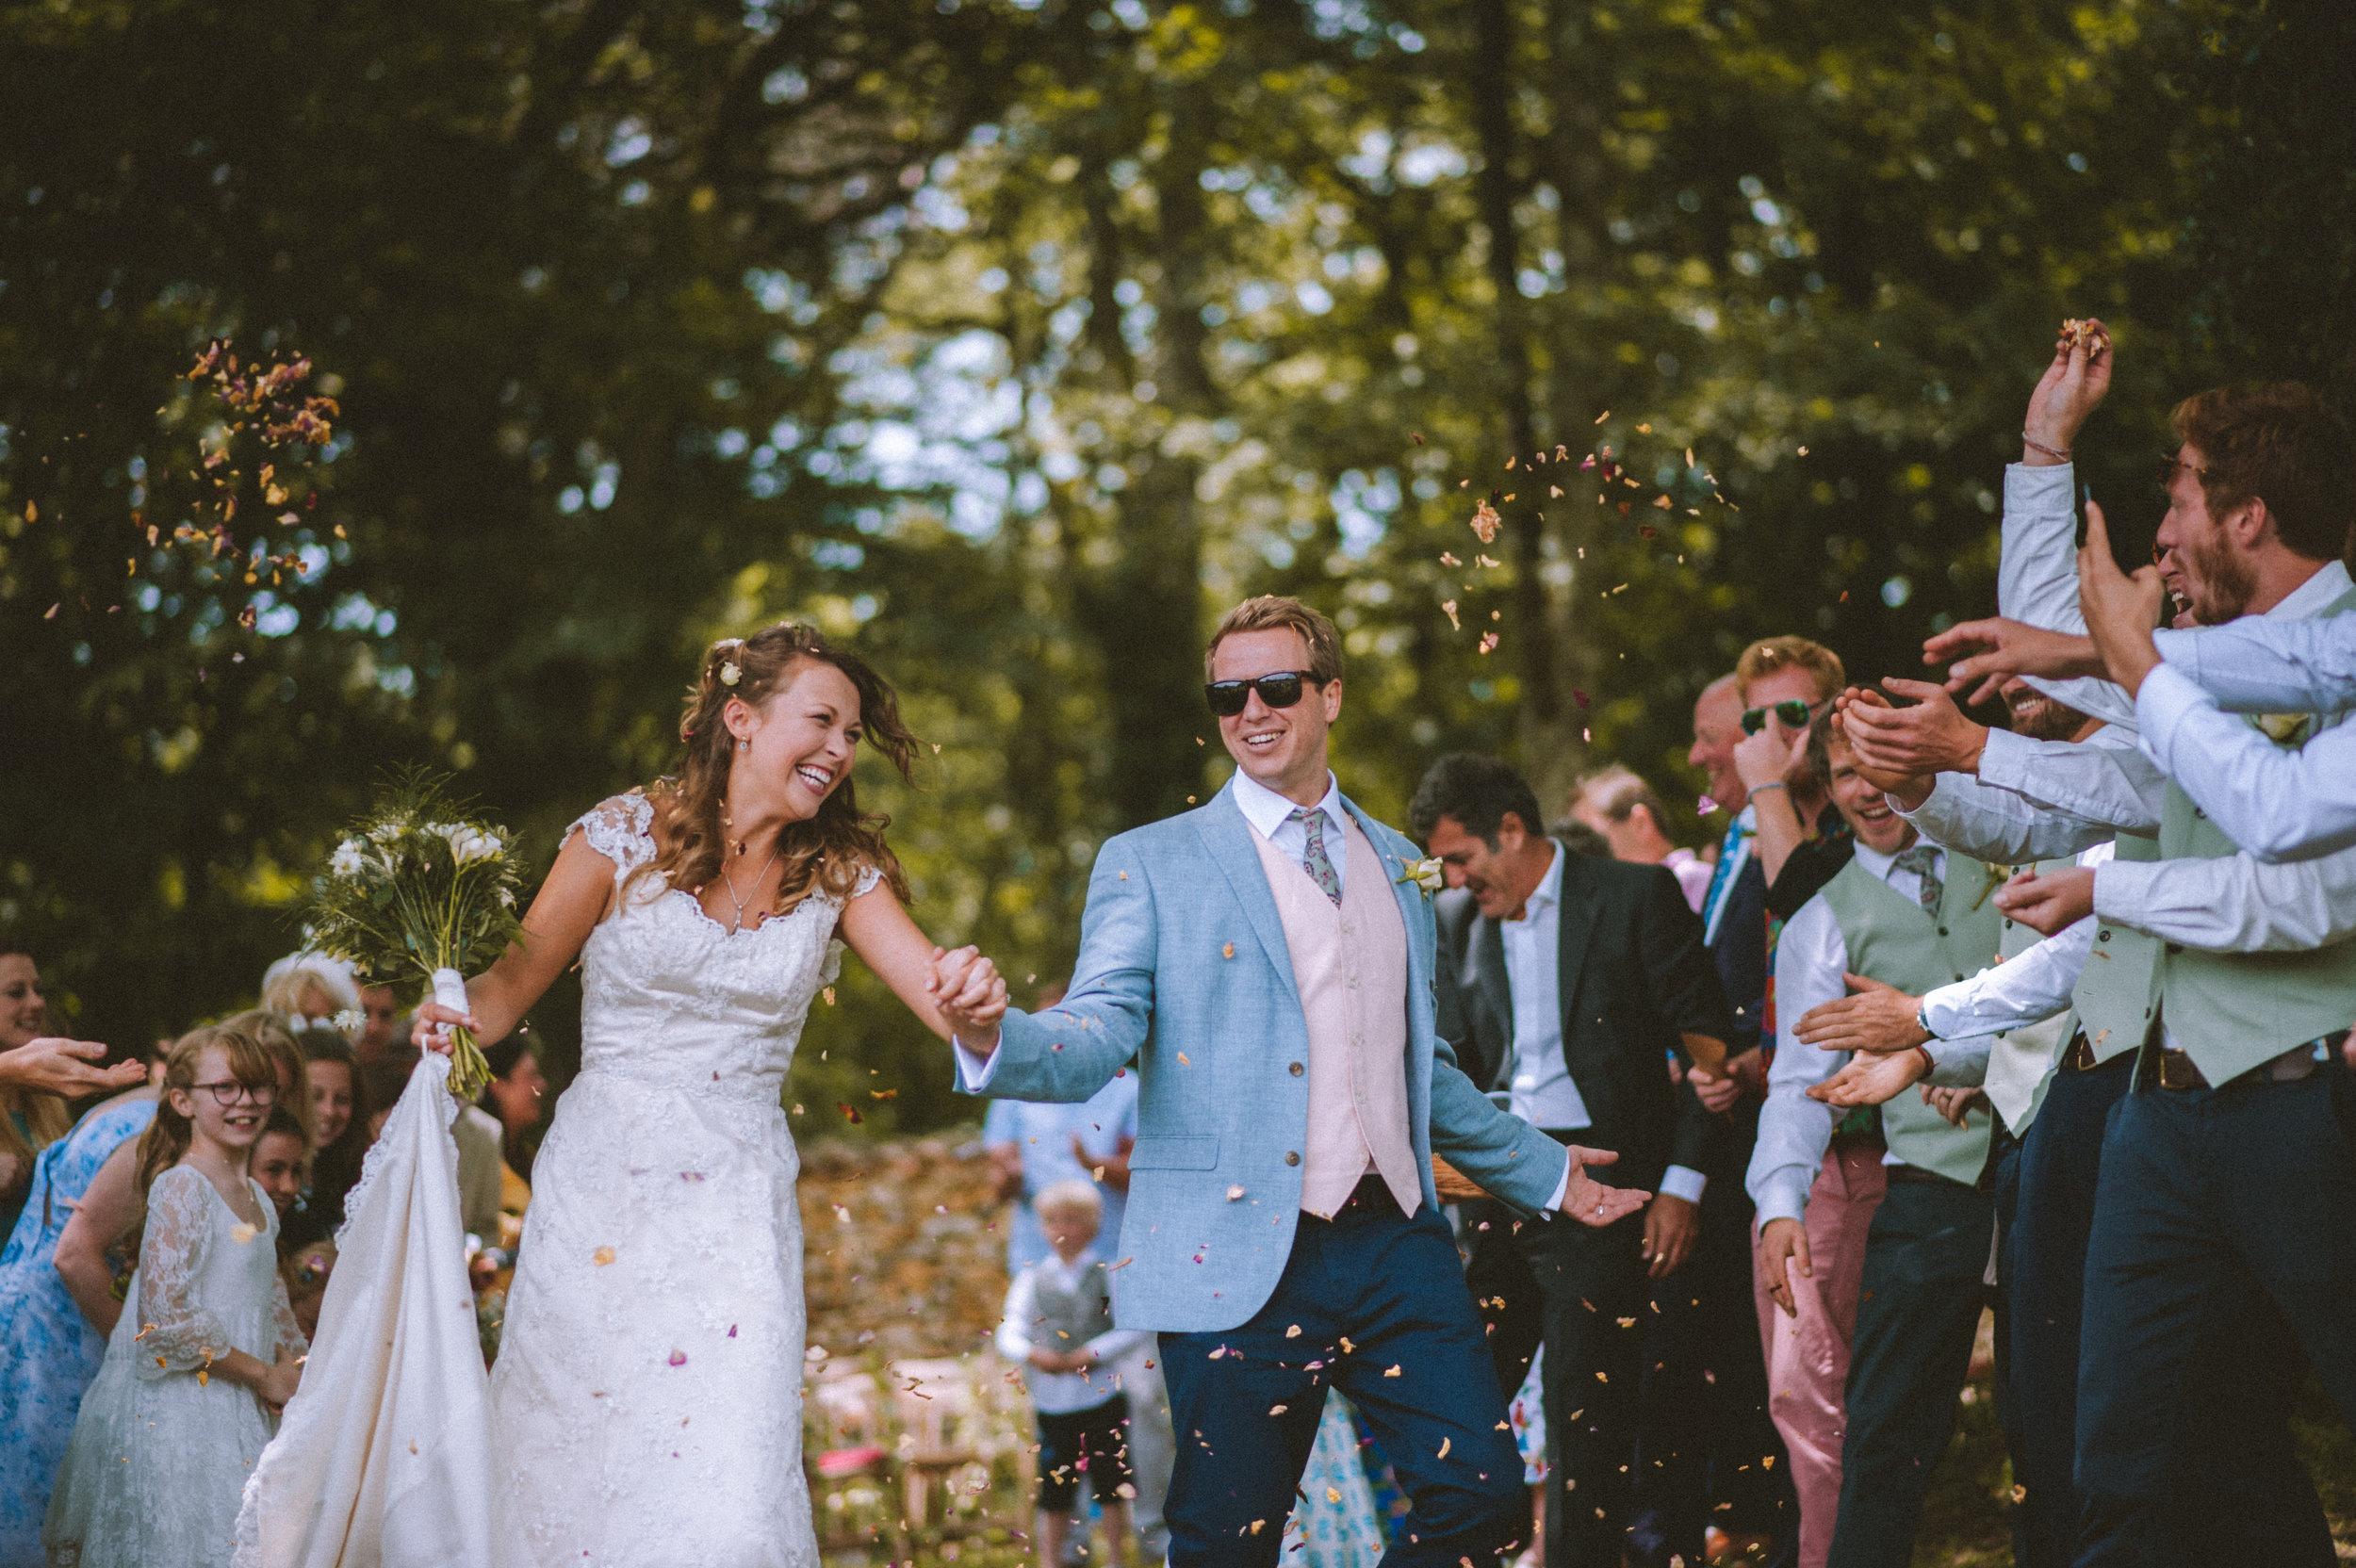 wedding-photographer-dordogne-mark-shaw-8.jpg